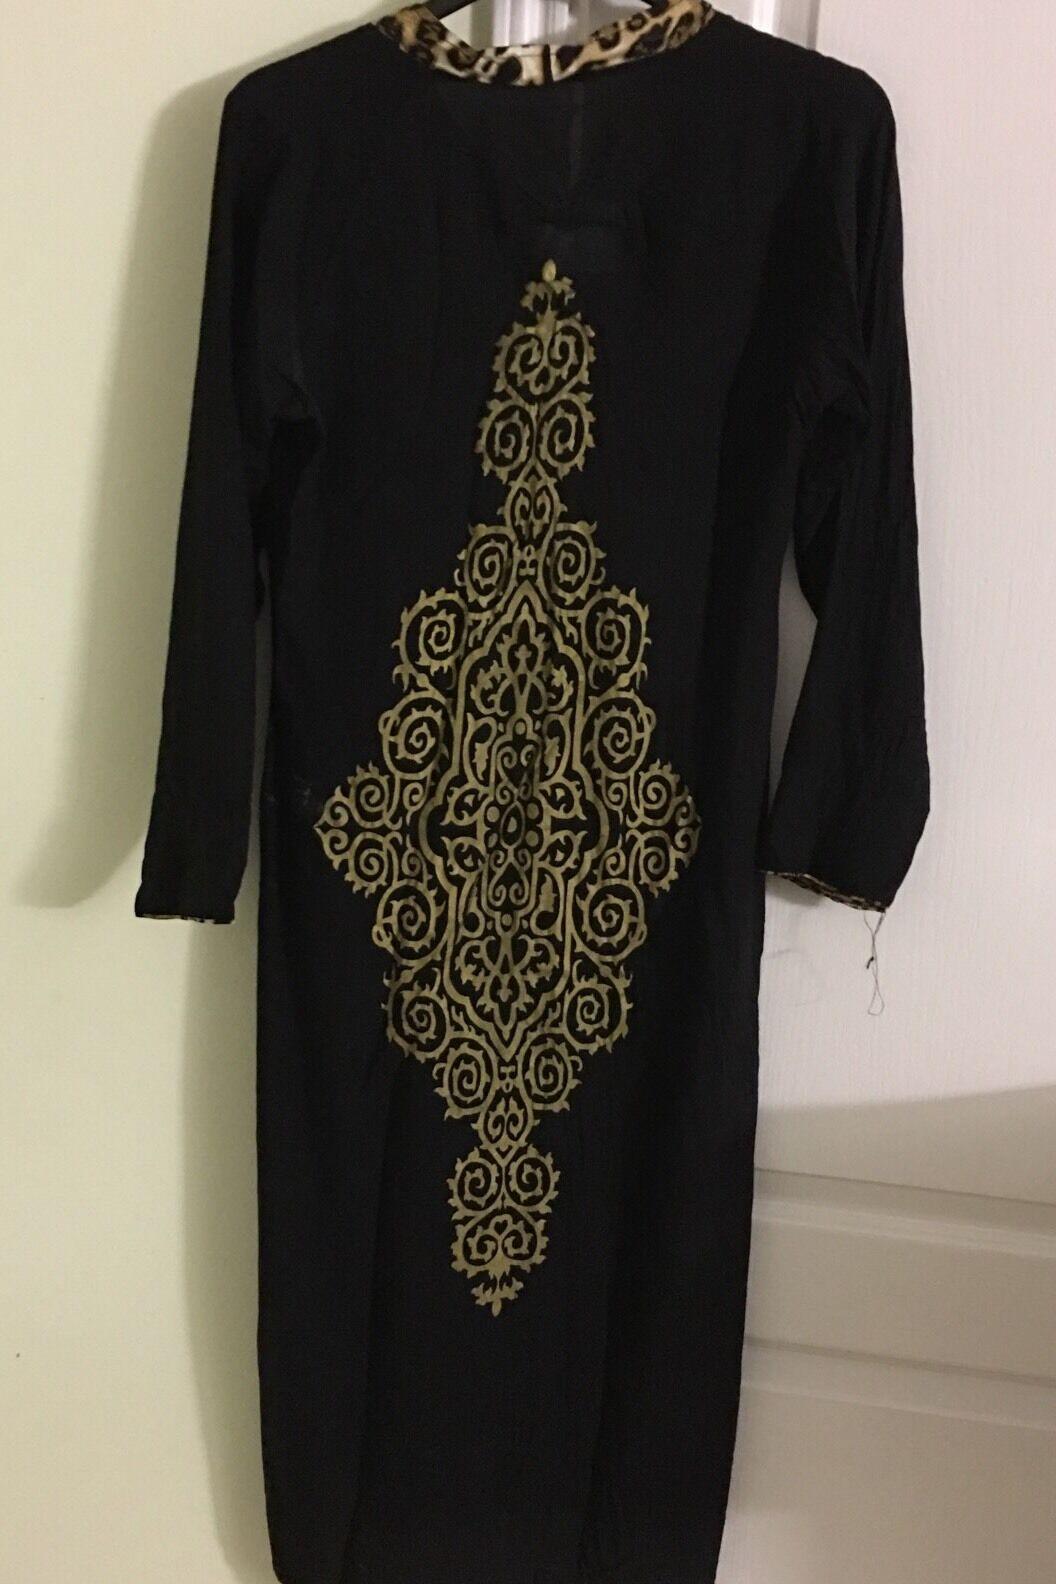 Malai Lawn Embossed Black Formal Pakistani IDesigner Beautiful Kurti